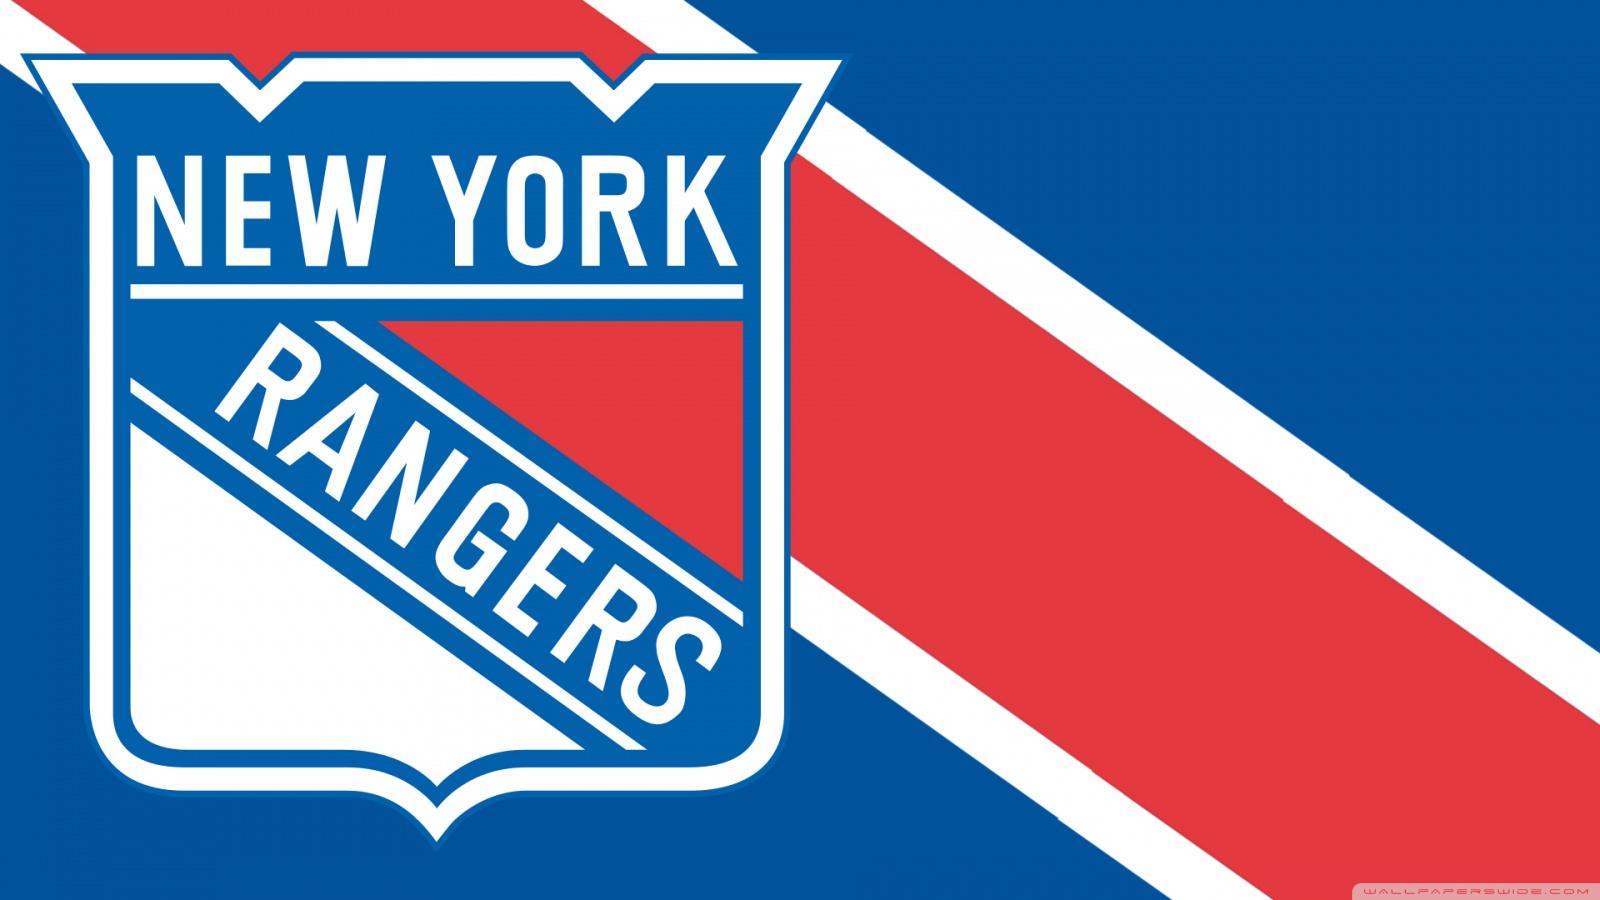 687544 New York Rangers Wallpapers 1600x900